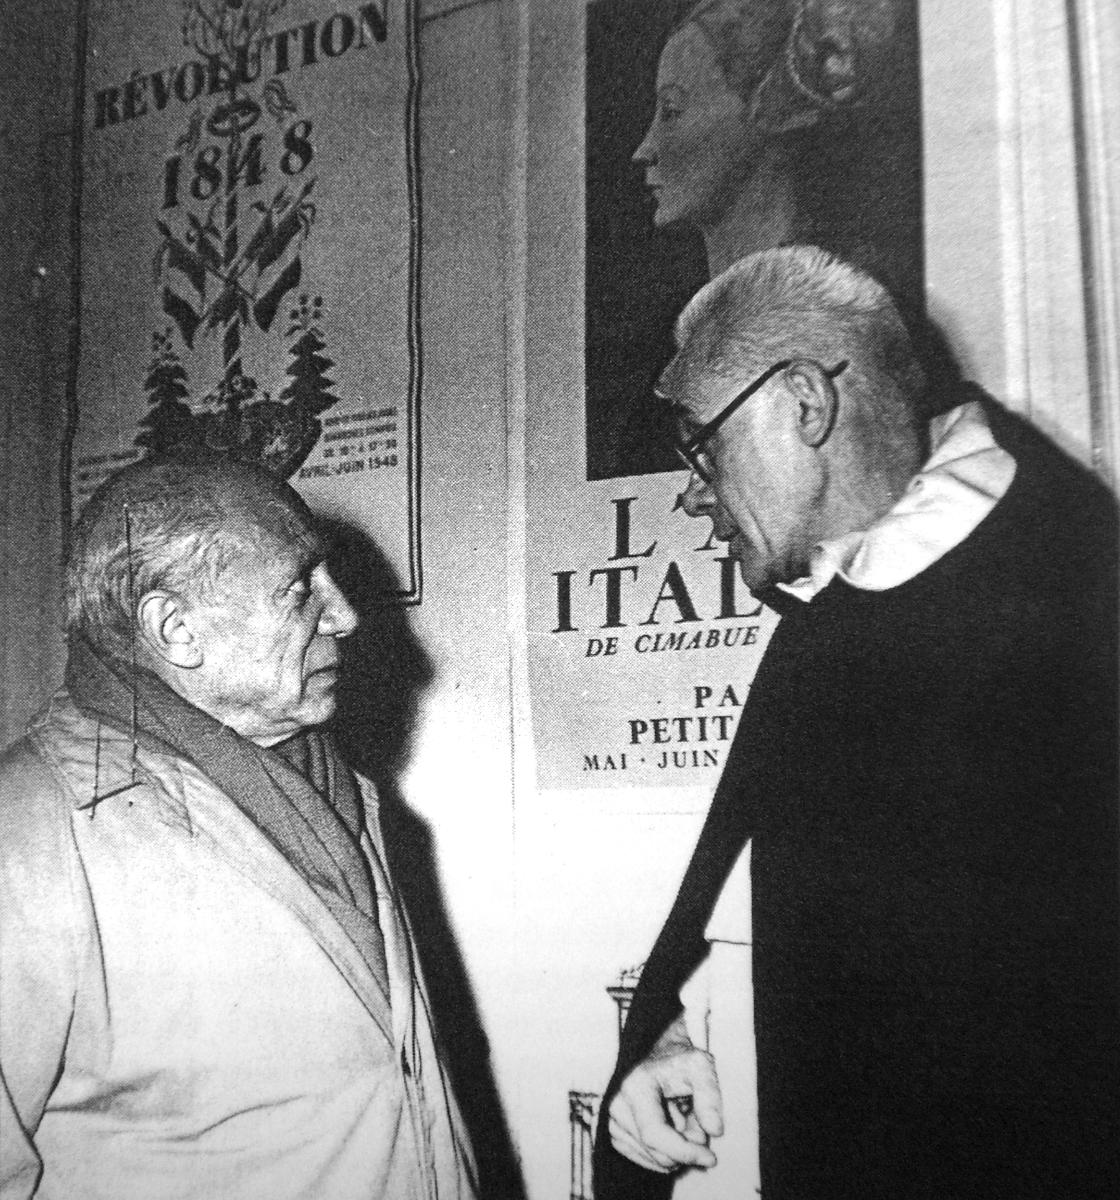 Couturier conversando con Picasso.